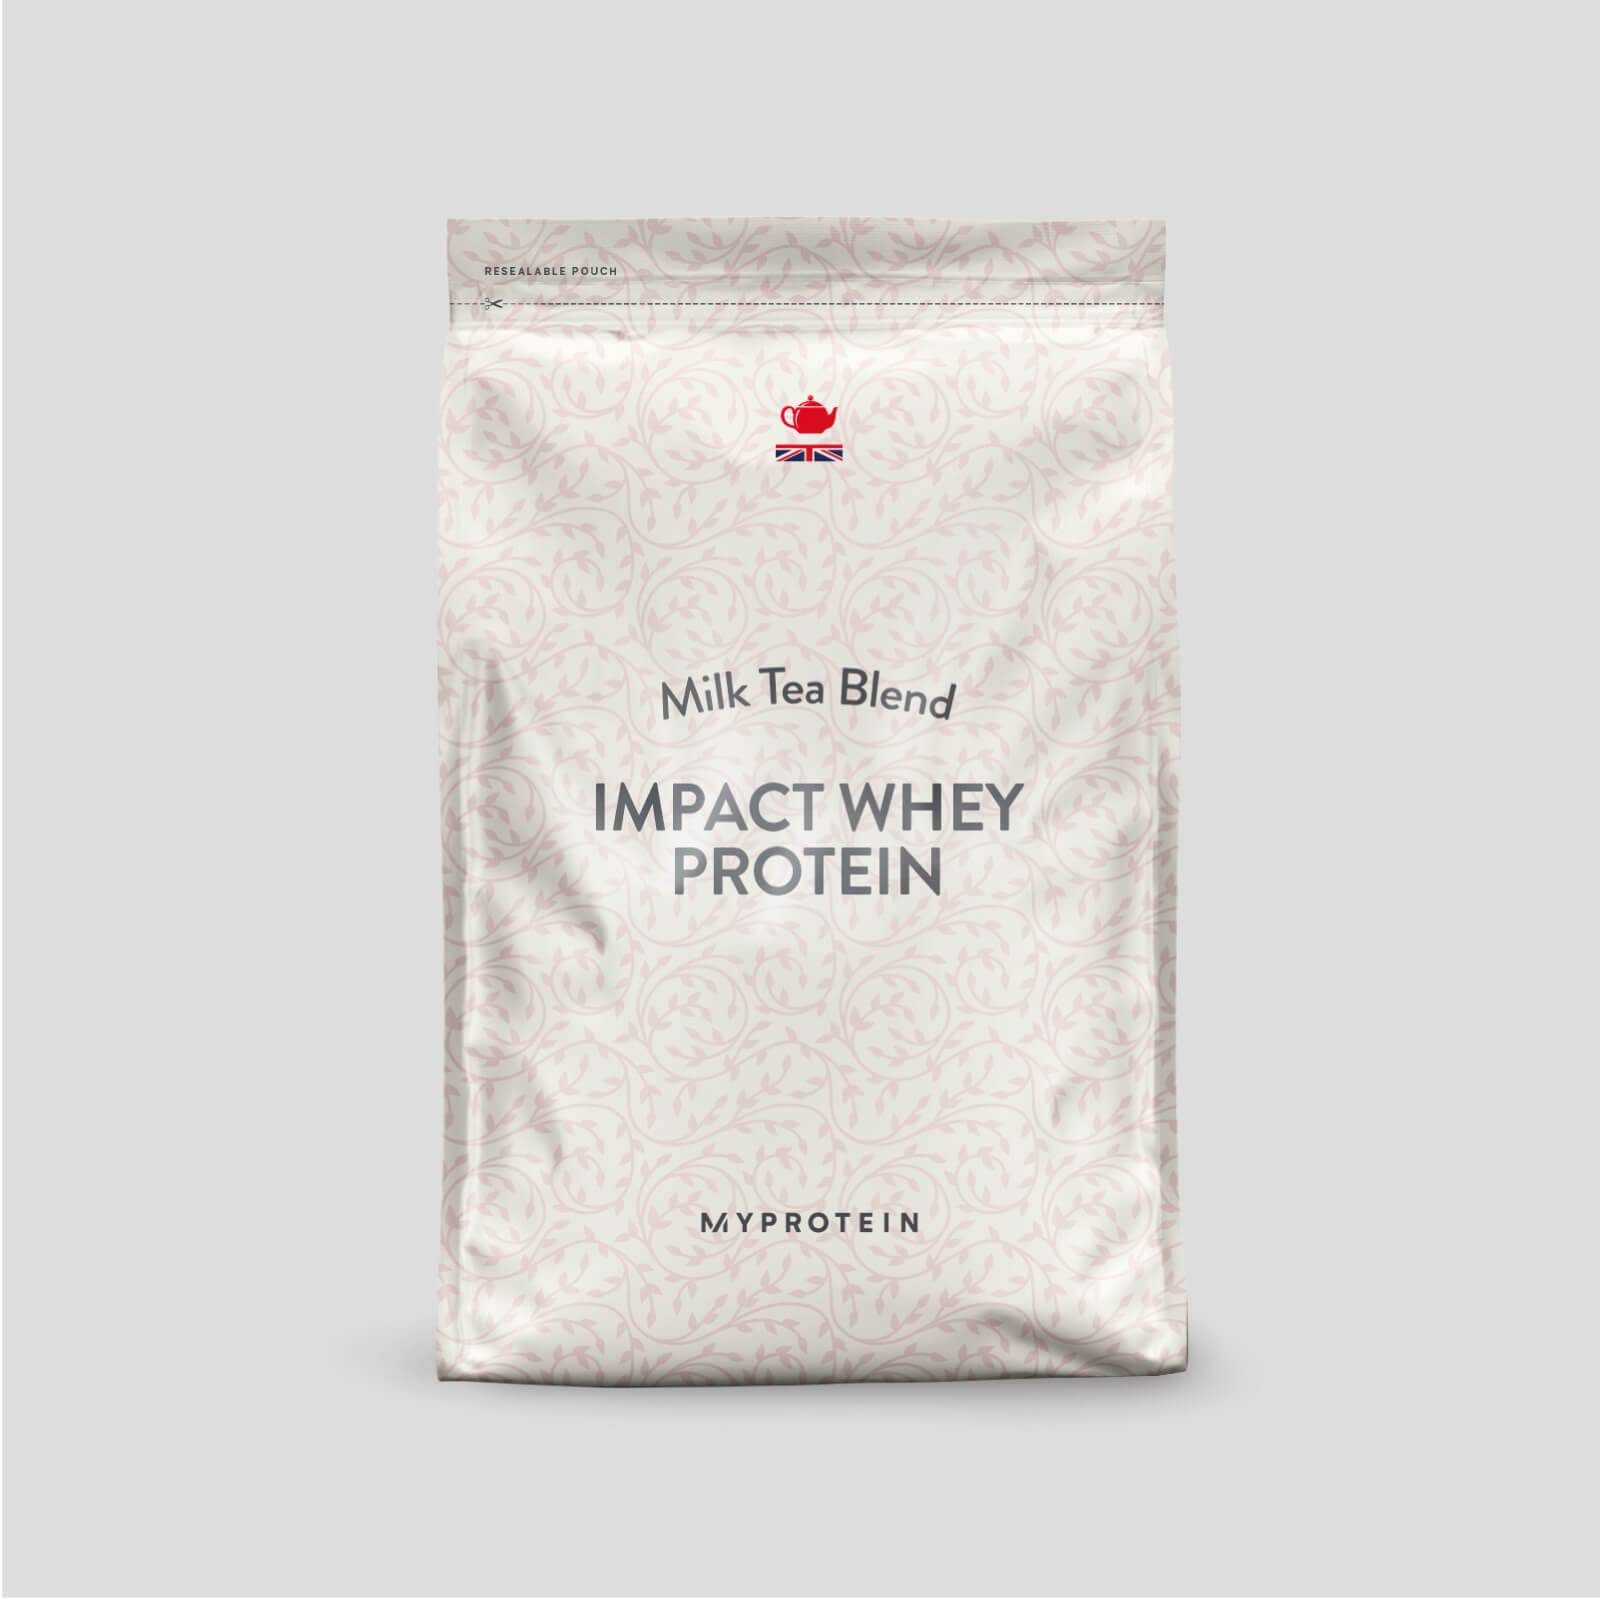 Myprotein Impact Whey Protein - 2.5kg - Milk Tea